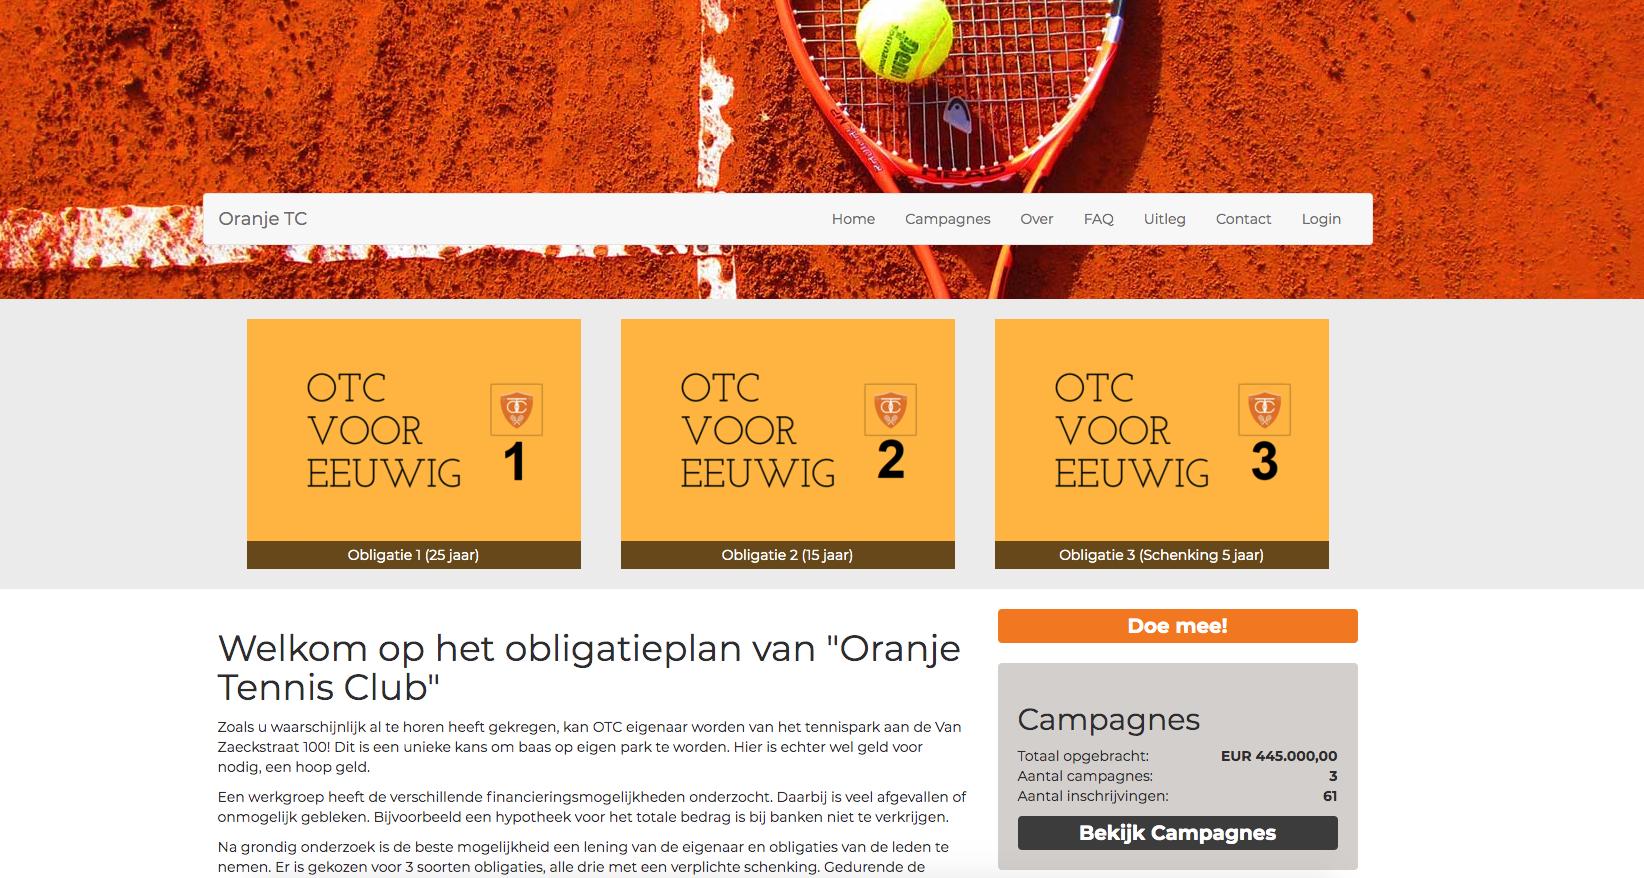 Oranje TC obligatie